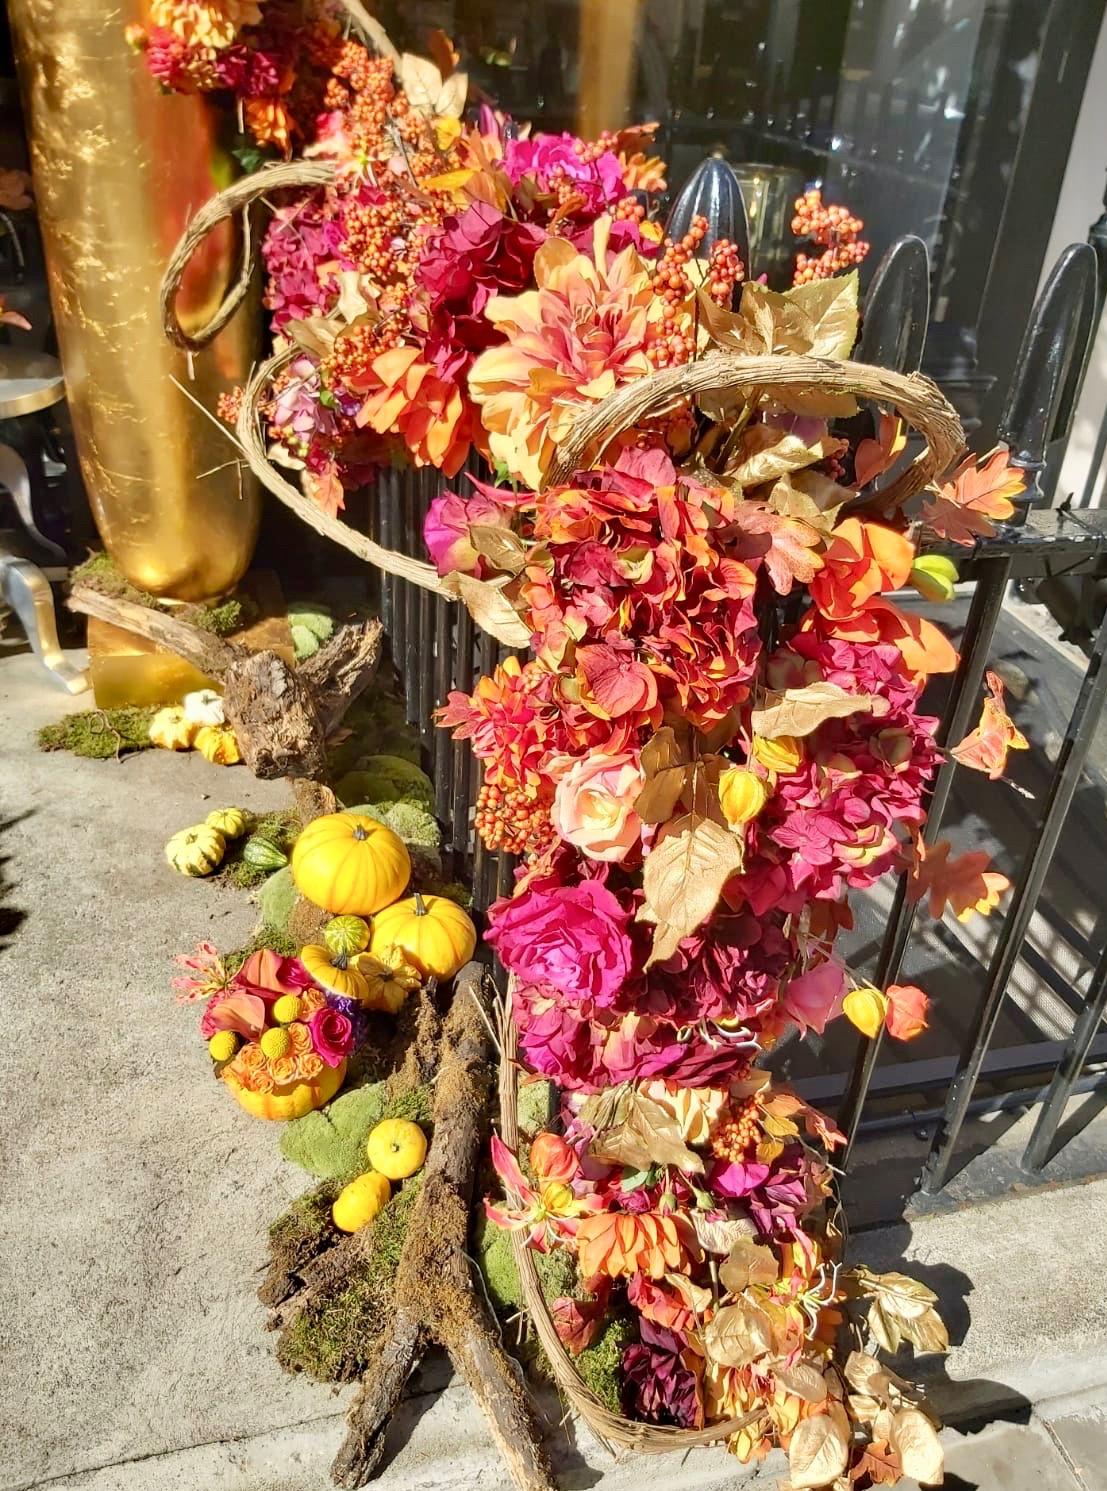 neill strain floral couture autumn 2019.jpg